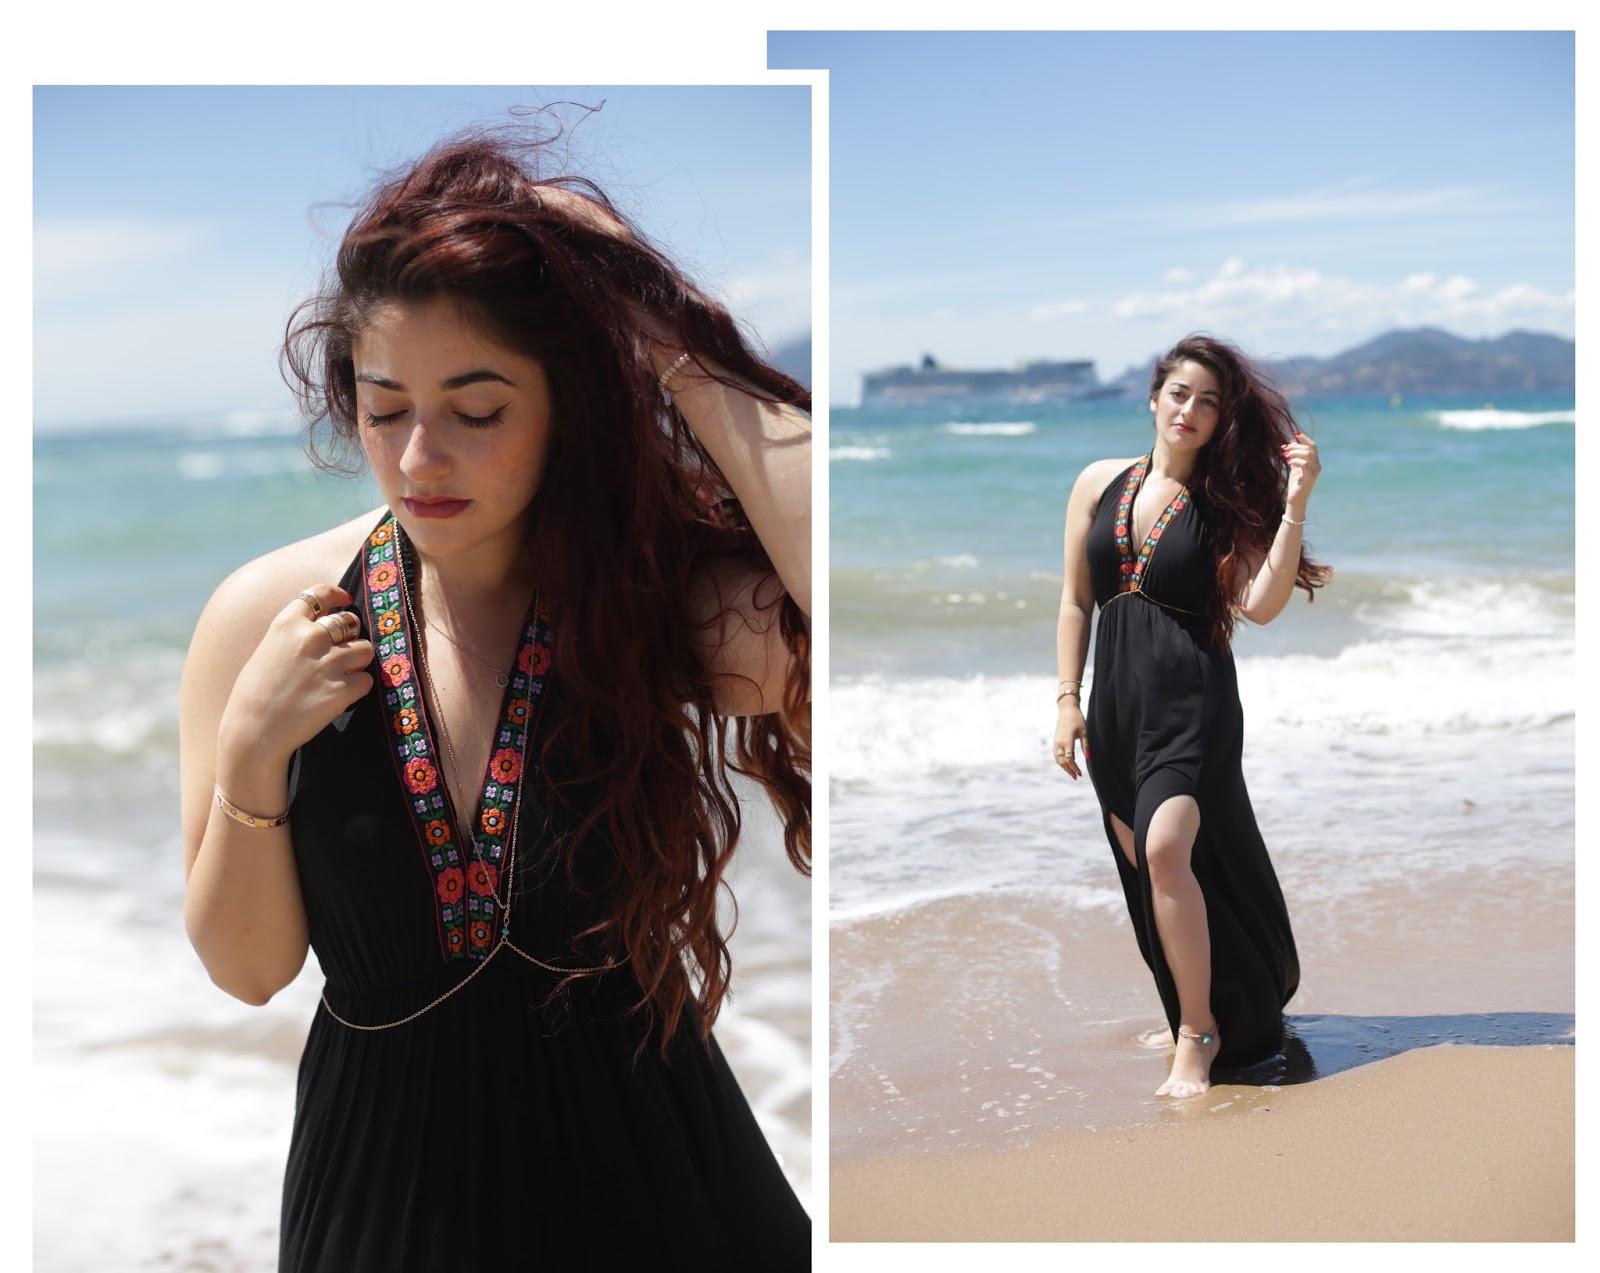 robe de plage fendue